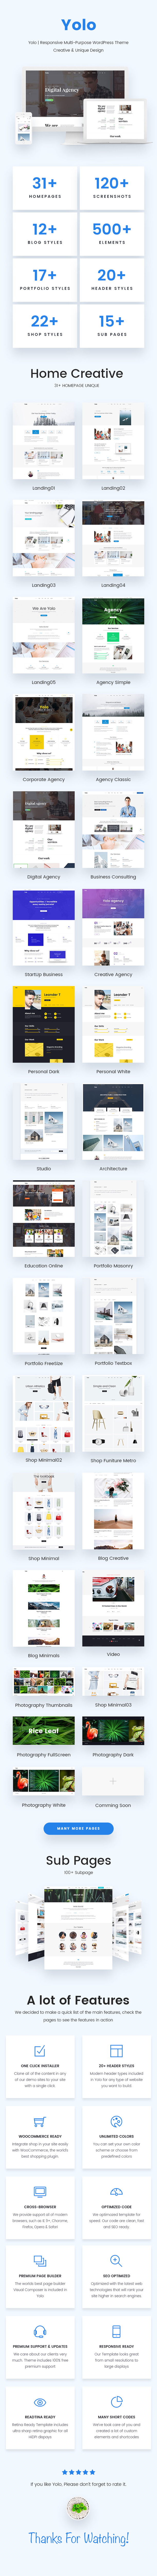 Yolo | Mehrzweck Kreative WordPress Themes - 1